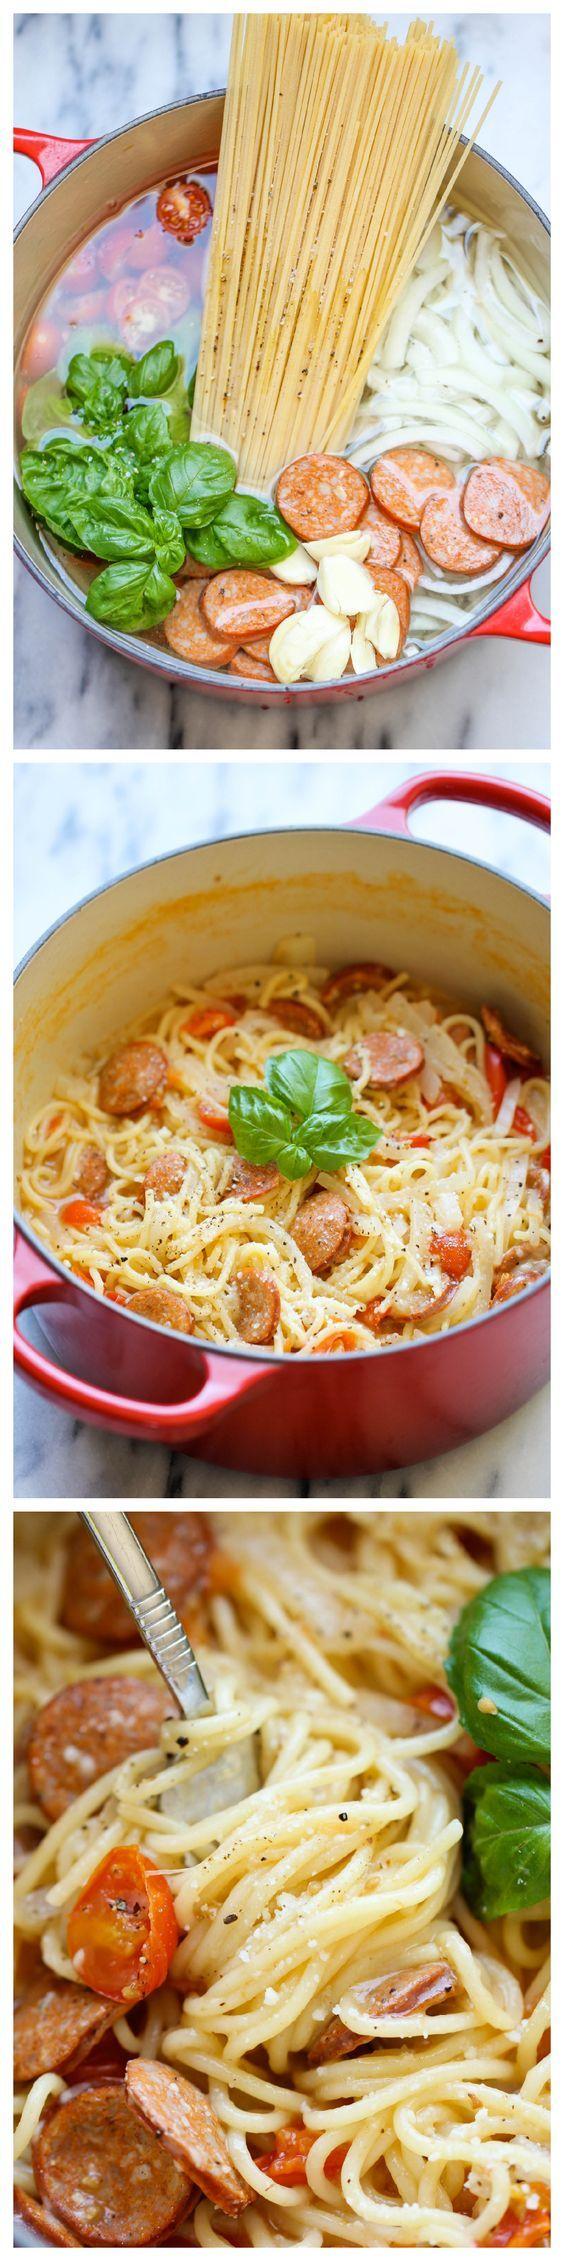 Molecamenina : Espaguete vapt-vupt